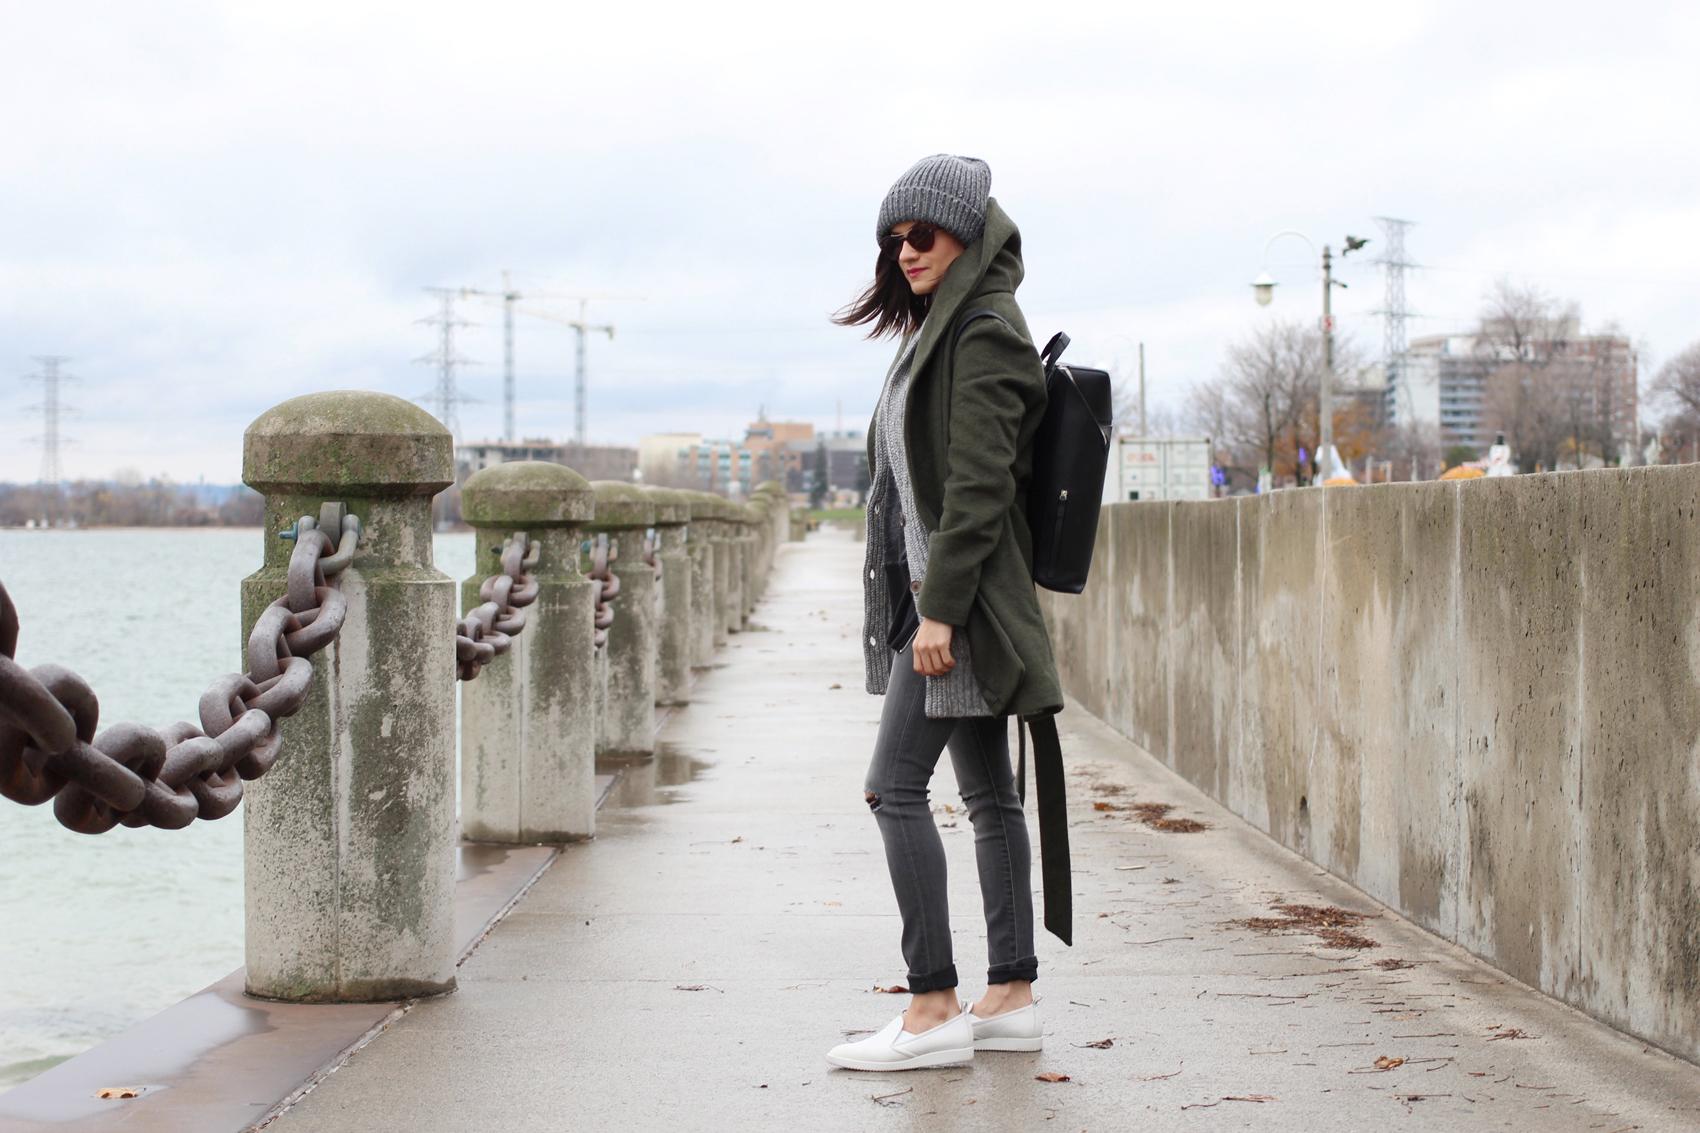 WoahStyle.com-Banana-Republic-jeans-knitted-grandfather-cardigan-Old-Navy-Olive-Wrap-coat-Gap-sweatshirt-Everlane-white-slip-on-sneakers-street-style-toronto-fashion-blogger-ootd_7607.jpg